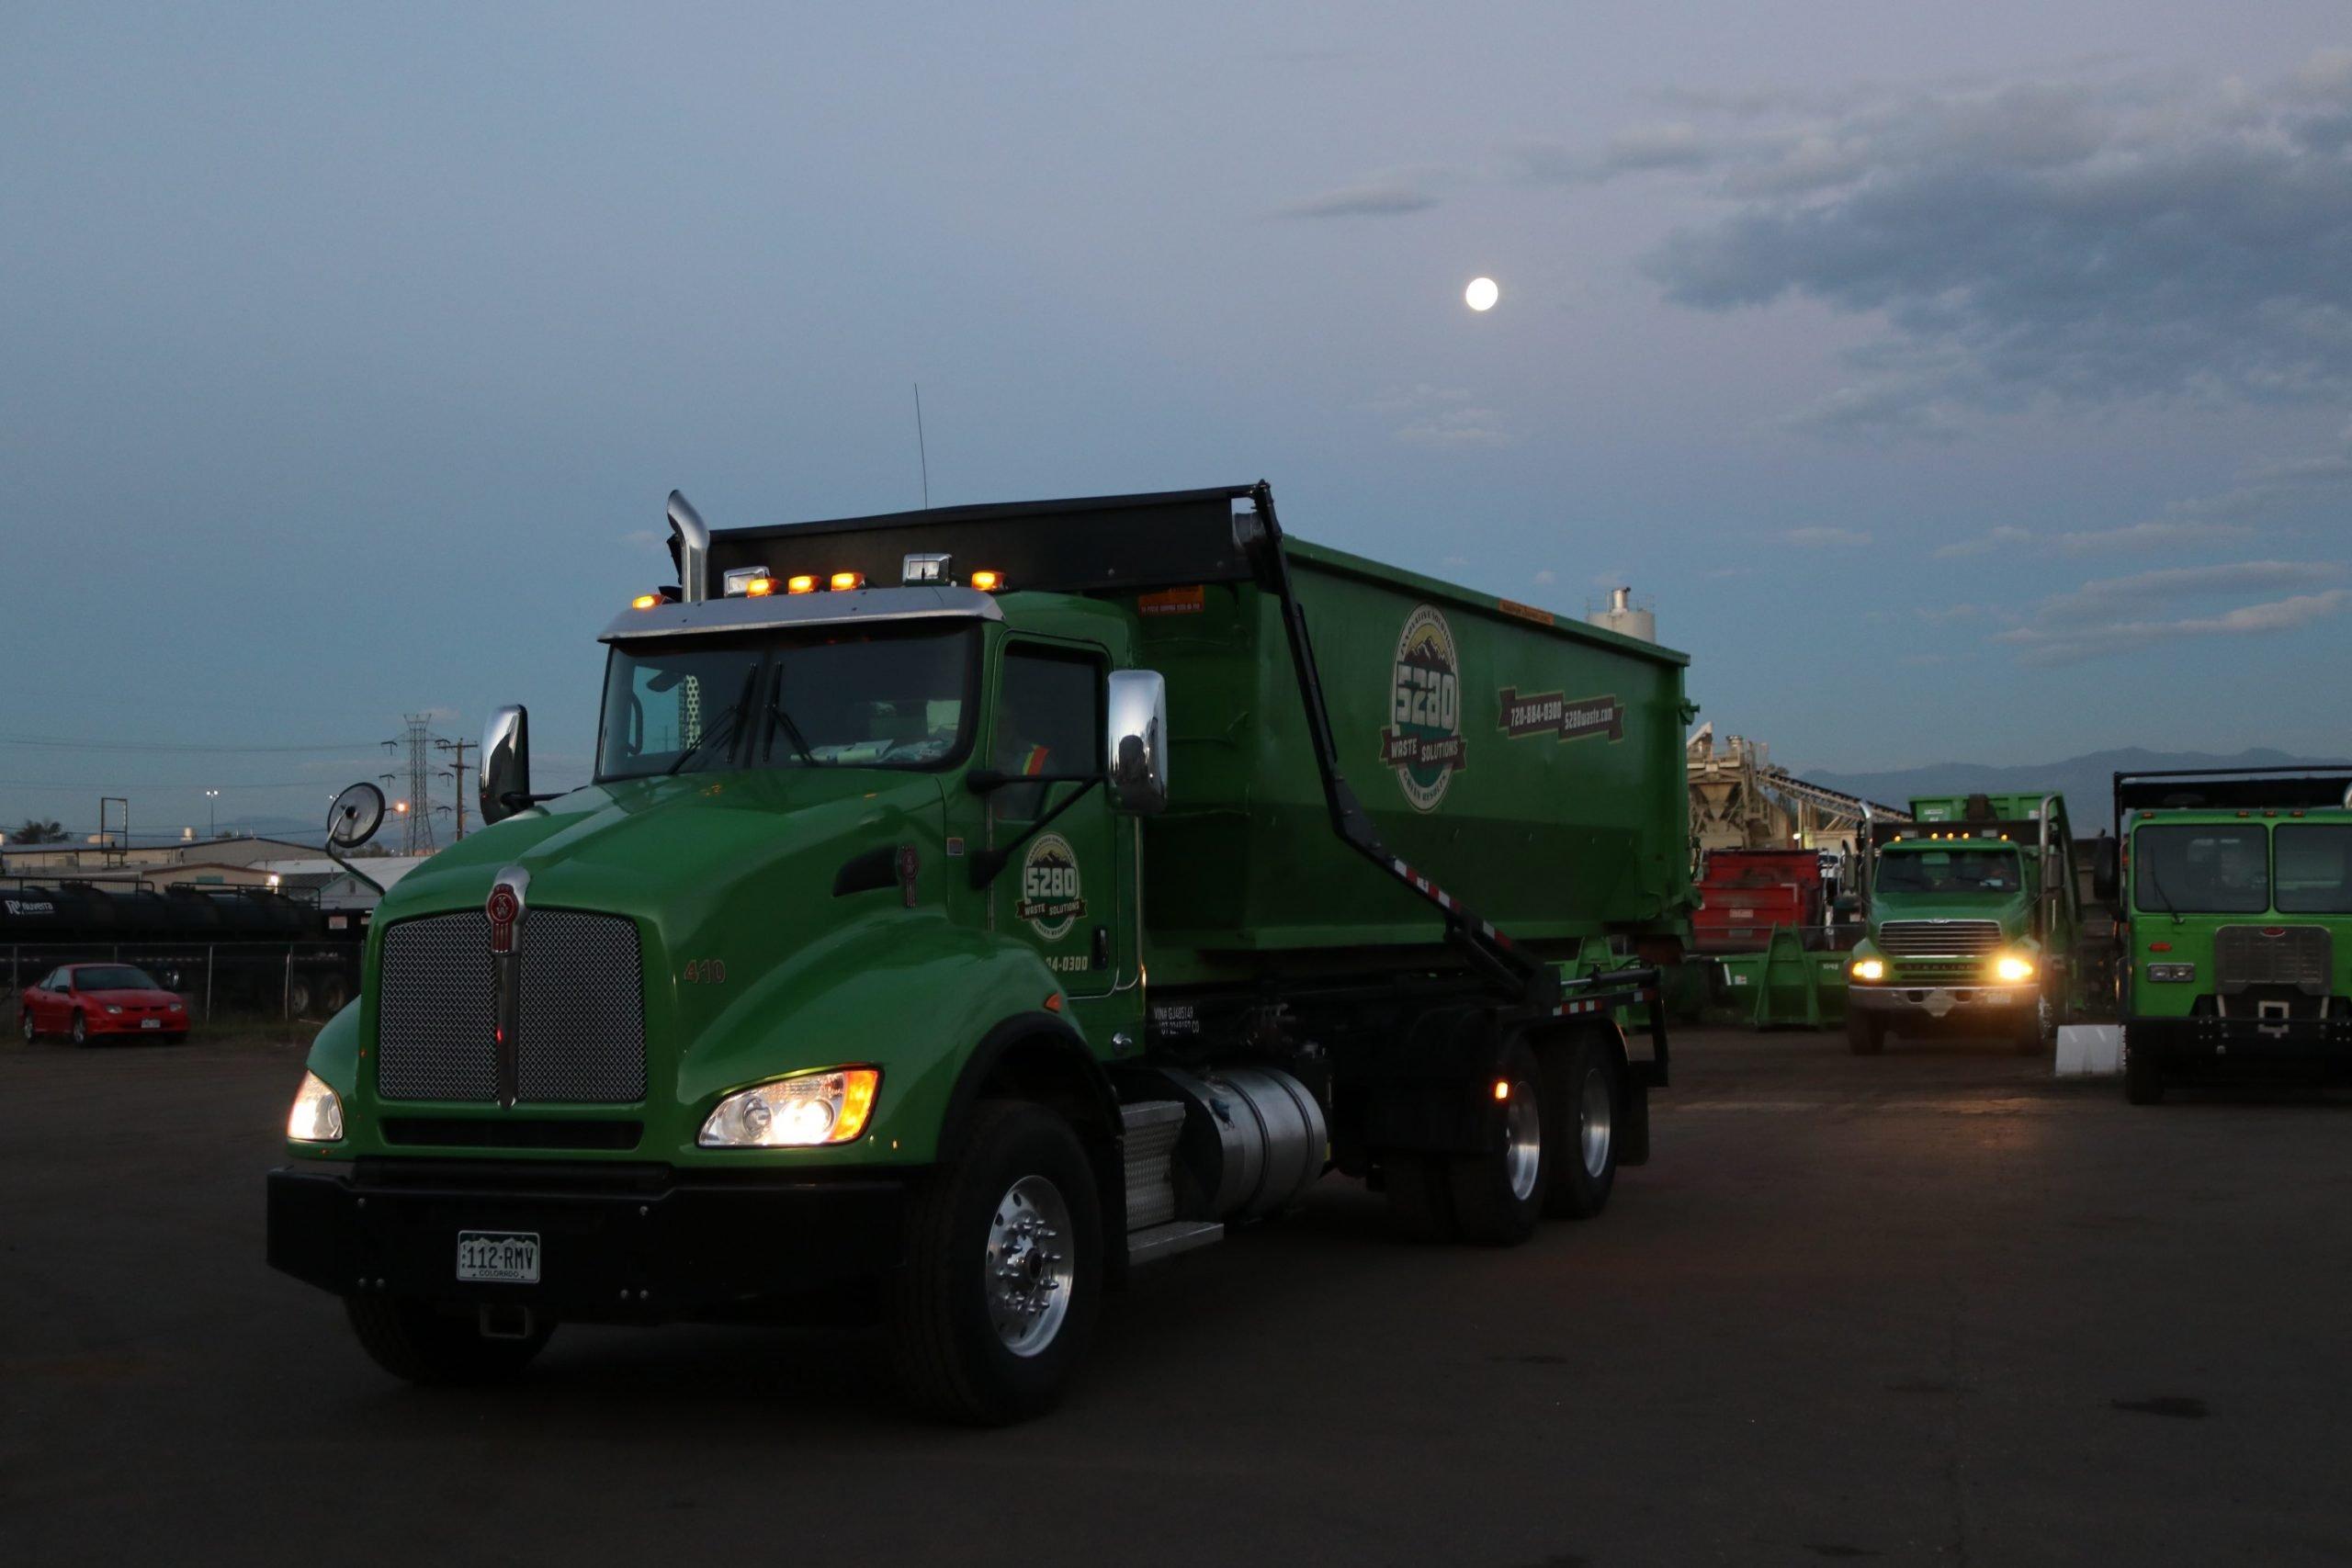 5280 Dumpster pictured at dusk